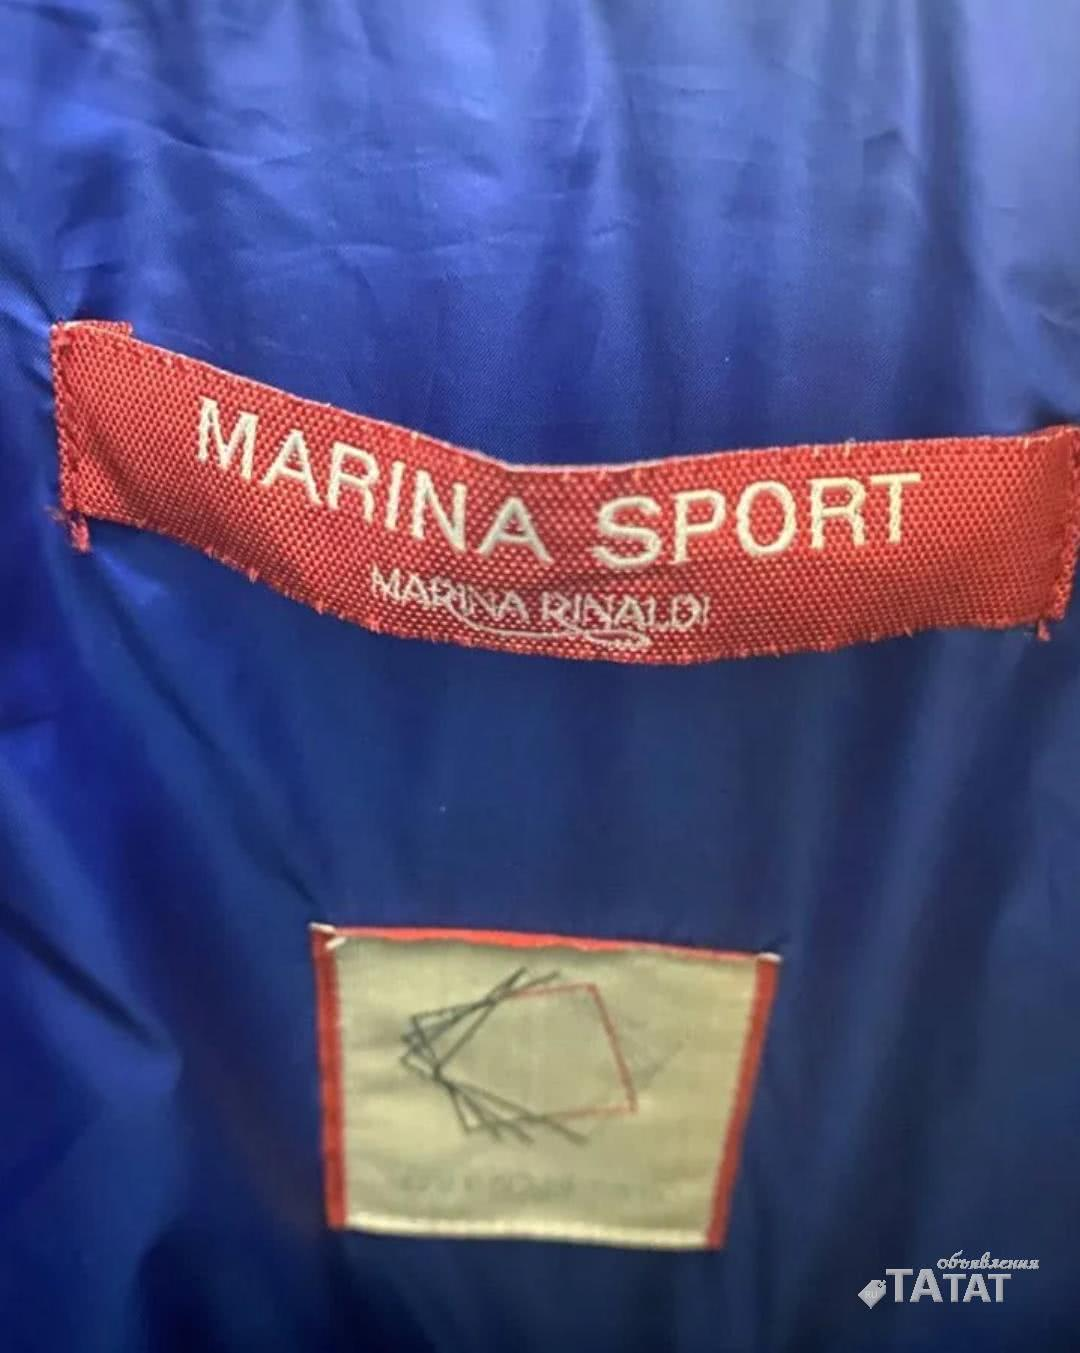 Marina rinaldi пуховик синий